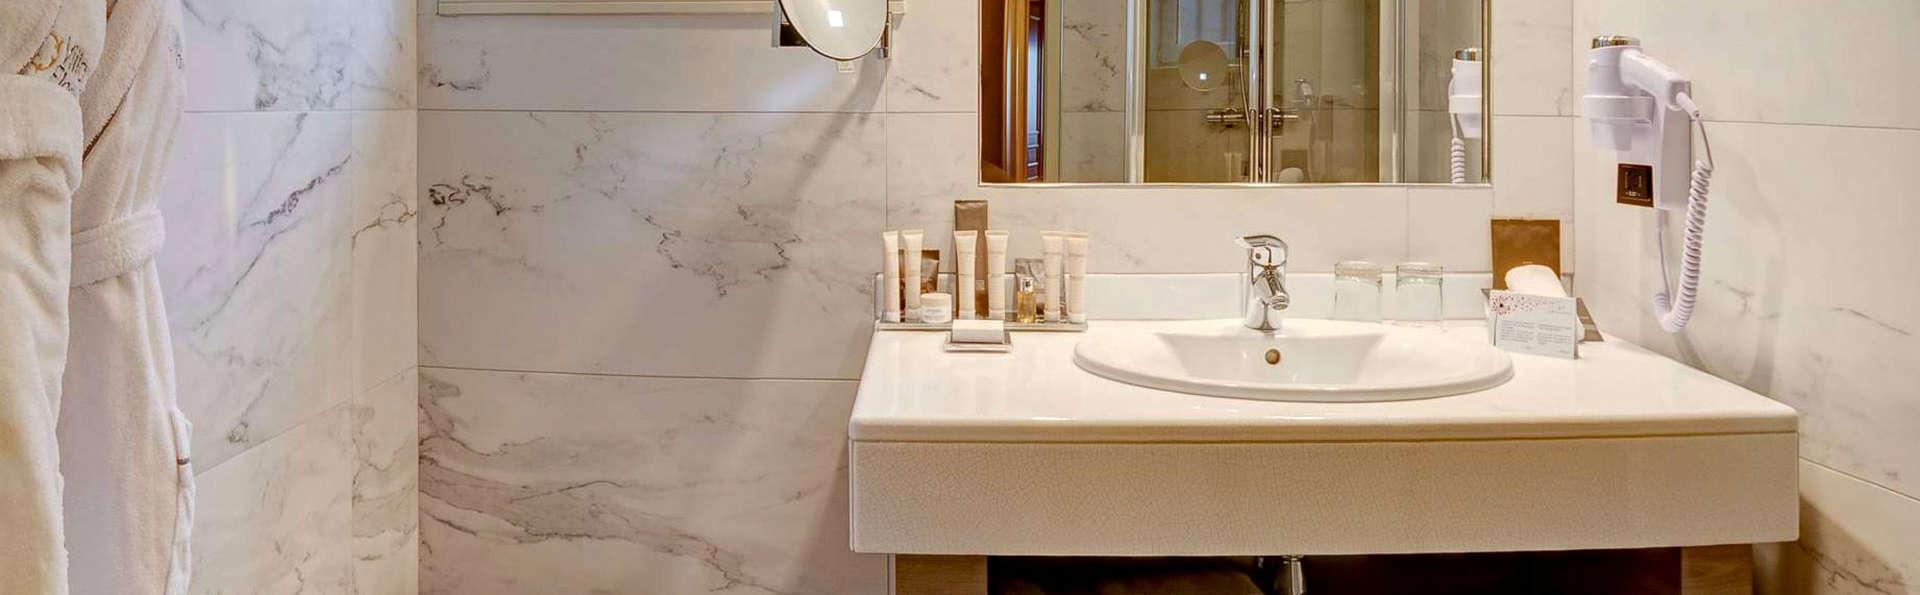 Hôtel Villa Florentine - Edit_Bathroom3.jpg